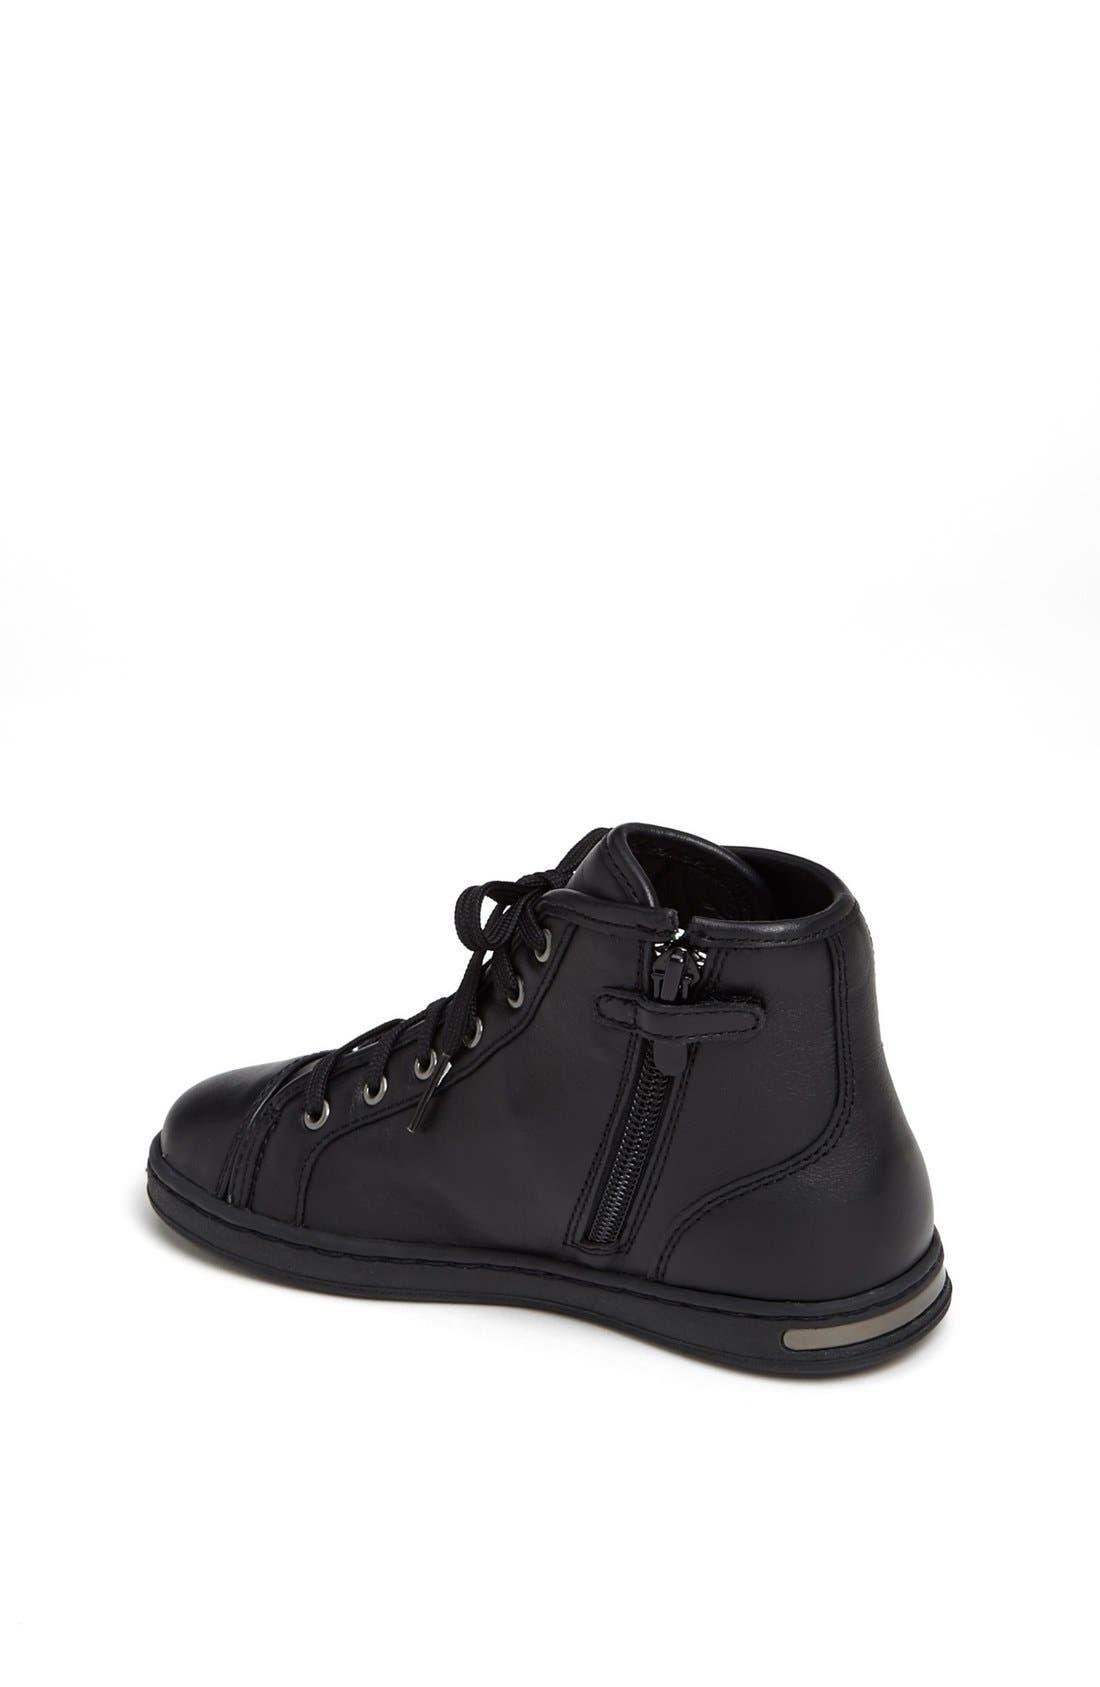 Alternate Image 2  - Dolce&Gabbana High Top Sneaker (Toddler & Little Kid)